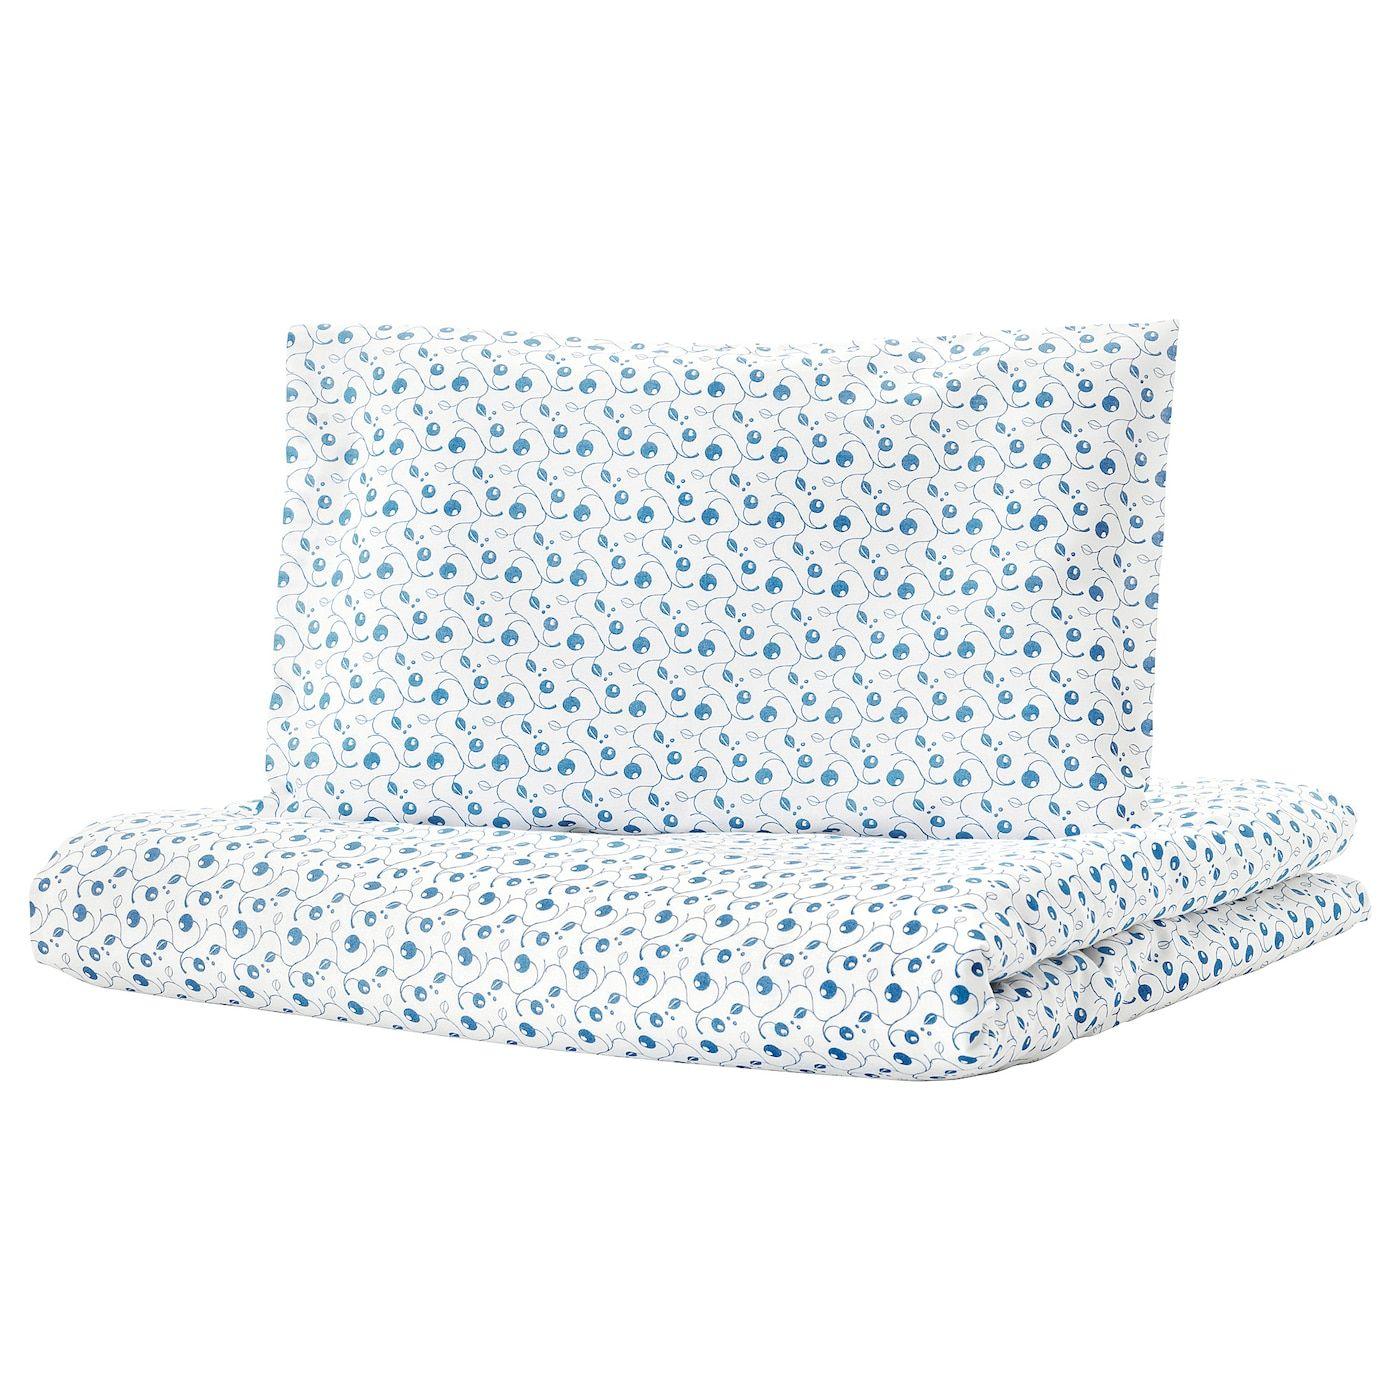 Ikea Gulsparv Crib Duvet Cover Pillowcase Blueberry Patterned